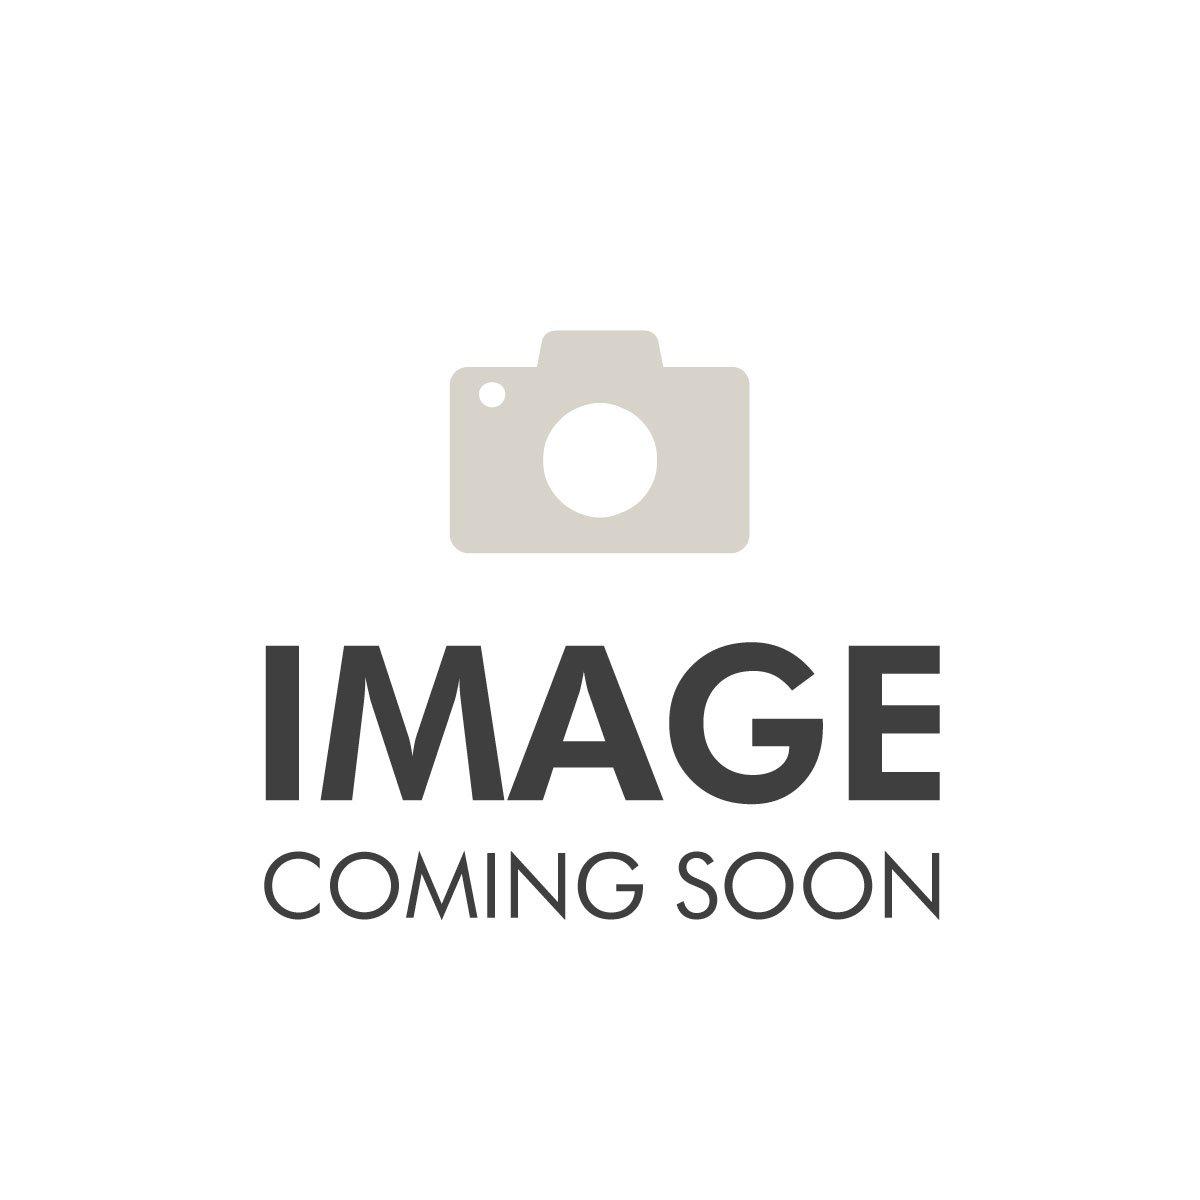 Leon Paul - Midi-Fence - Coquille de fleuret